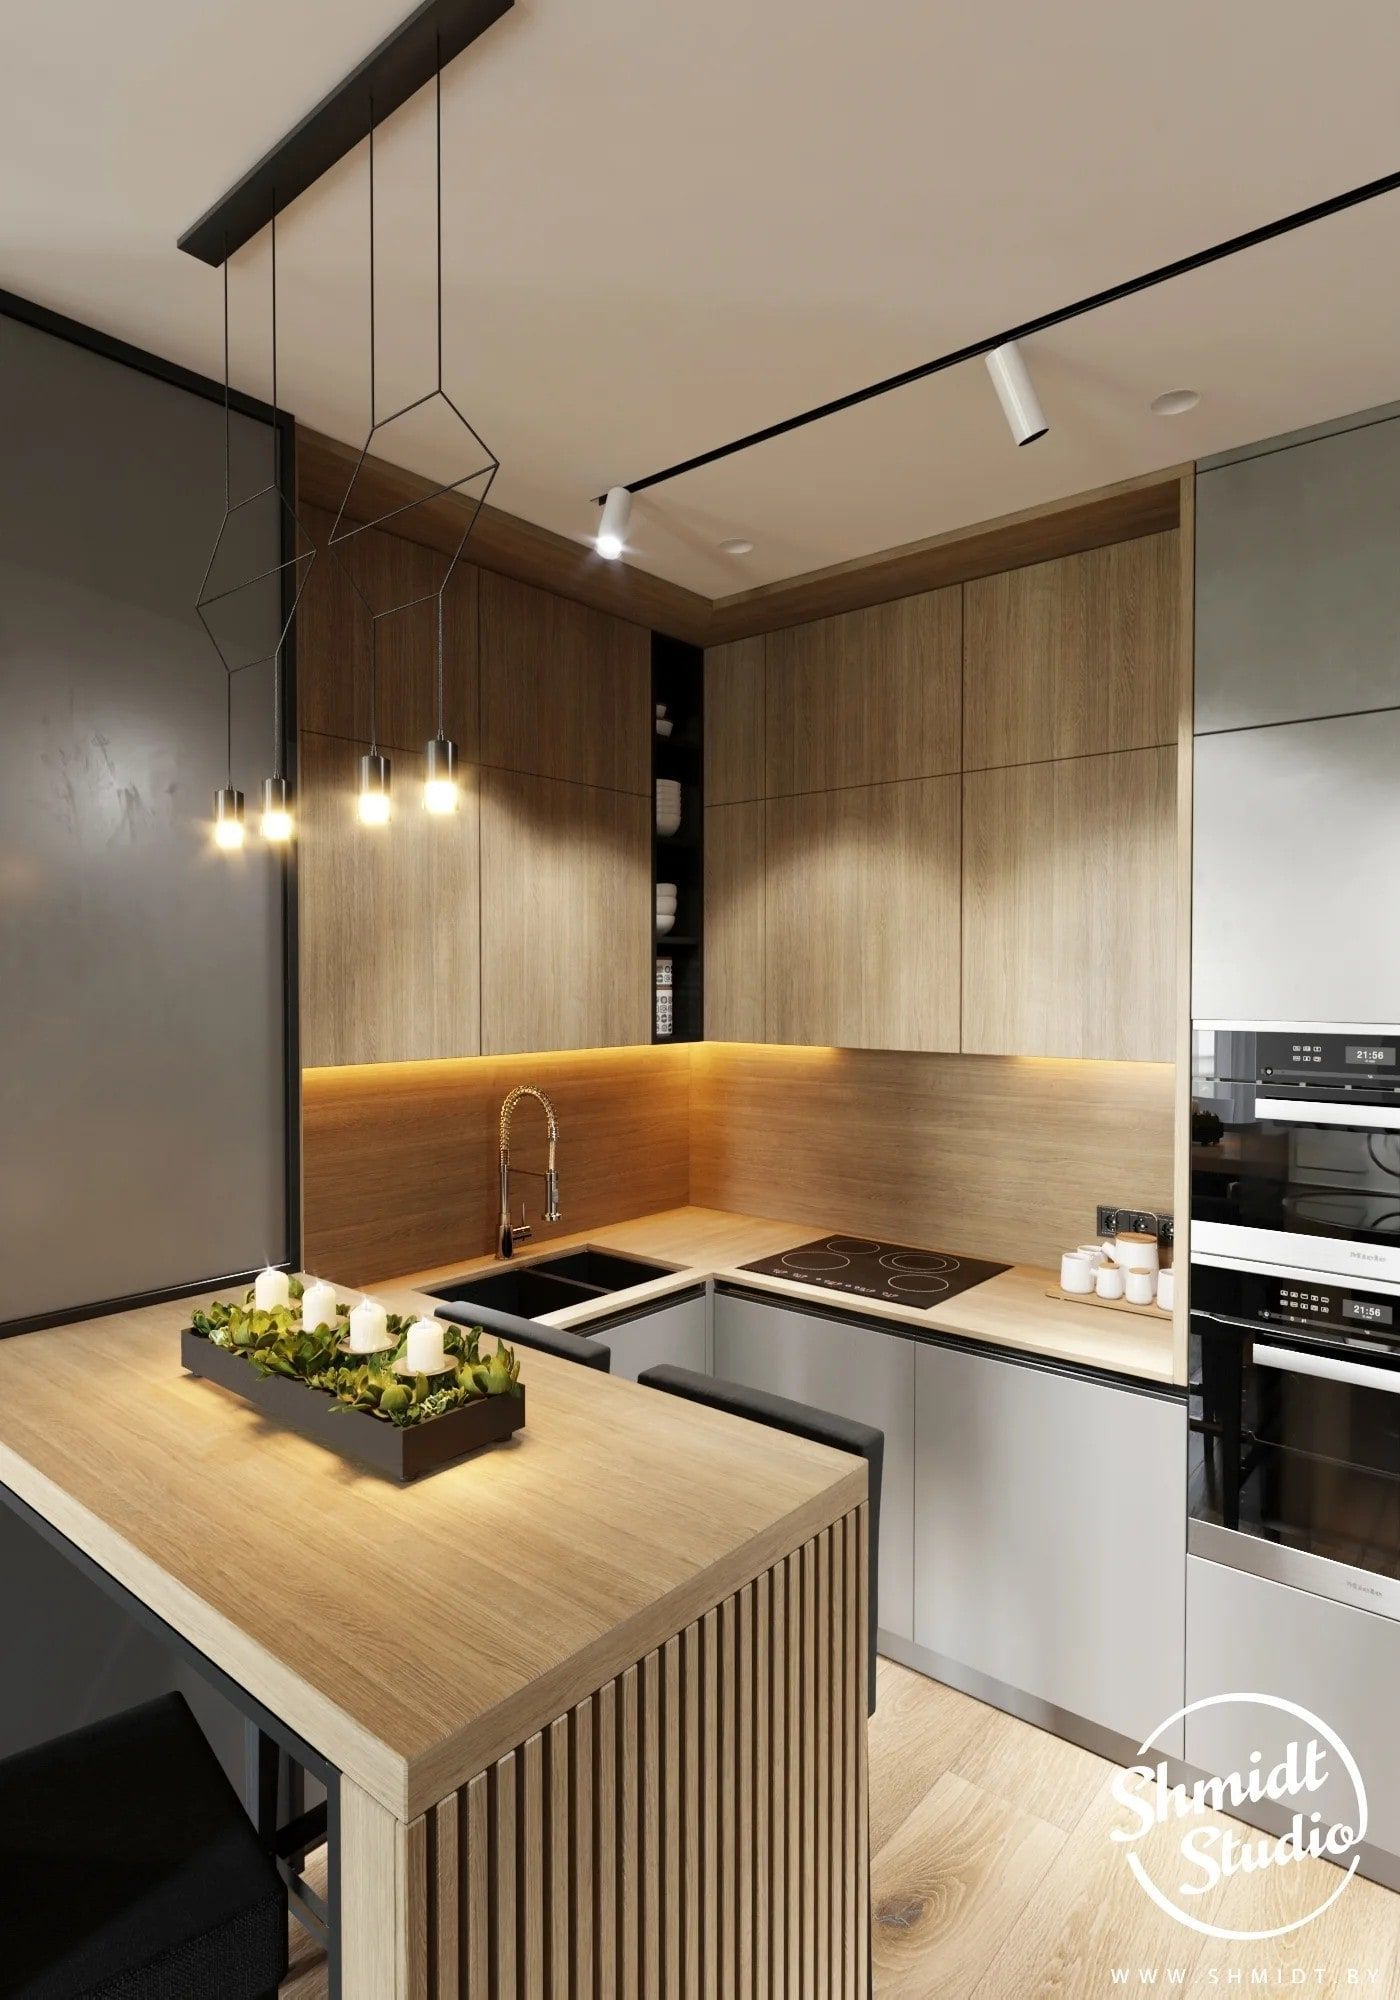 Cuisine Design Cuisine Design Ilot Cuisine Design Moderne Cuisine Design Moderne Blanche Cuisin Cuisine Moderne Cuisine Design Moderne Cuisine Appartement